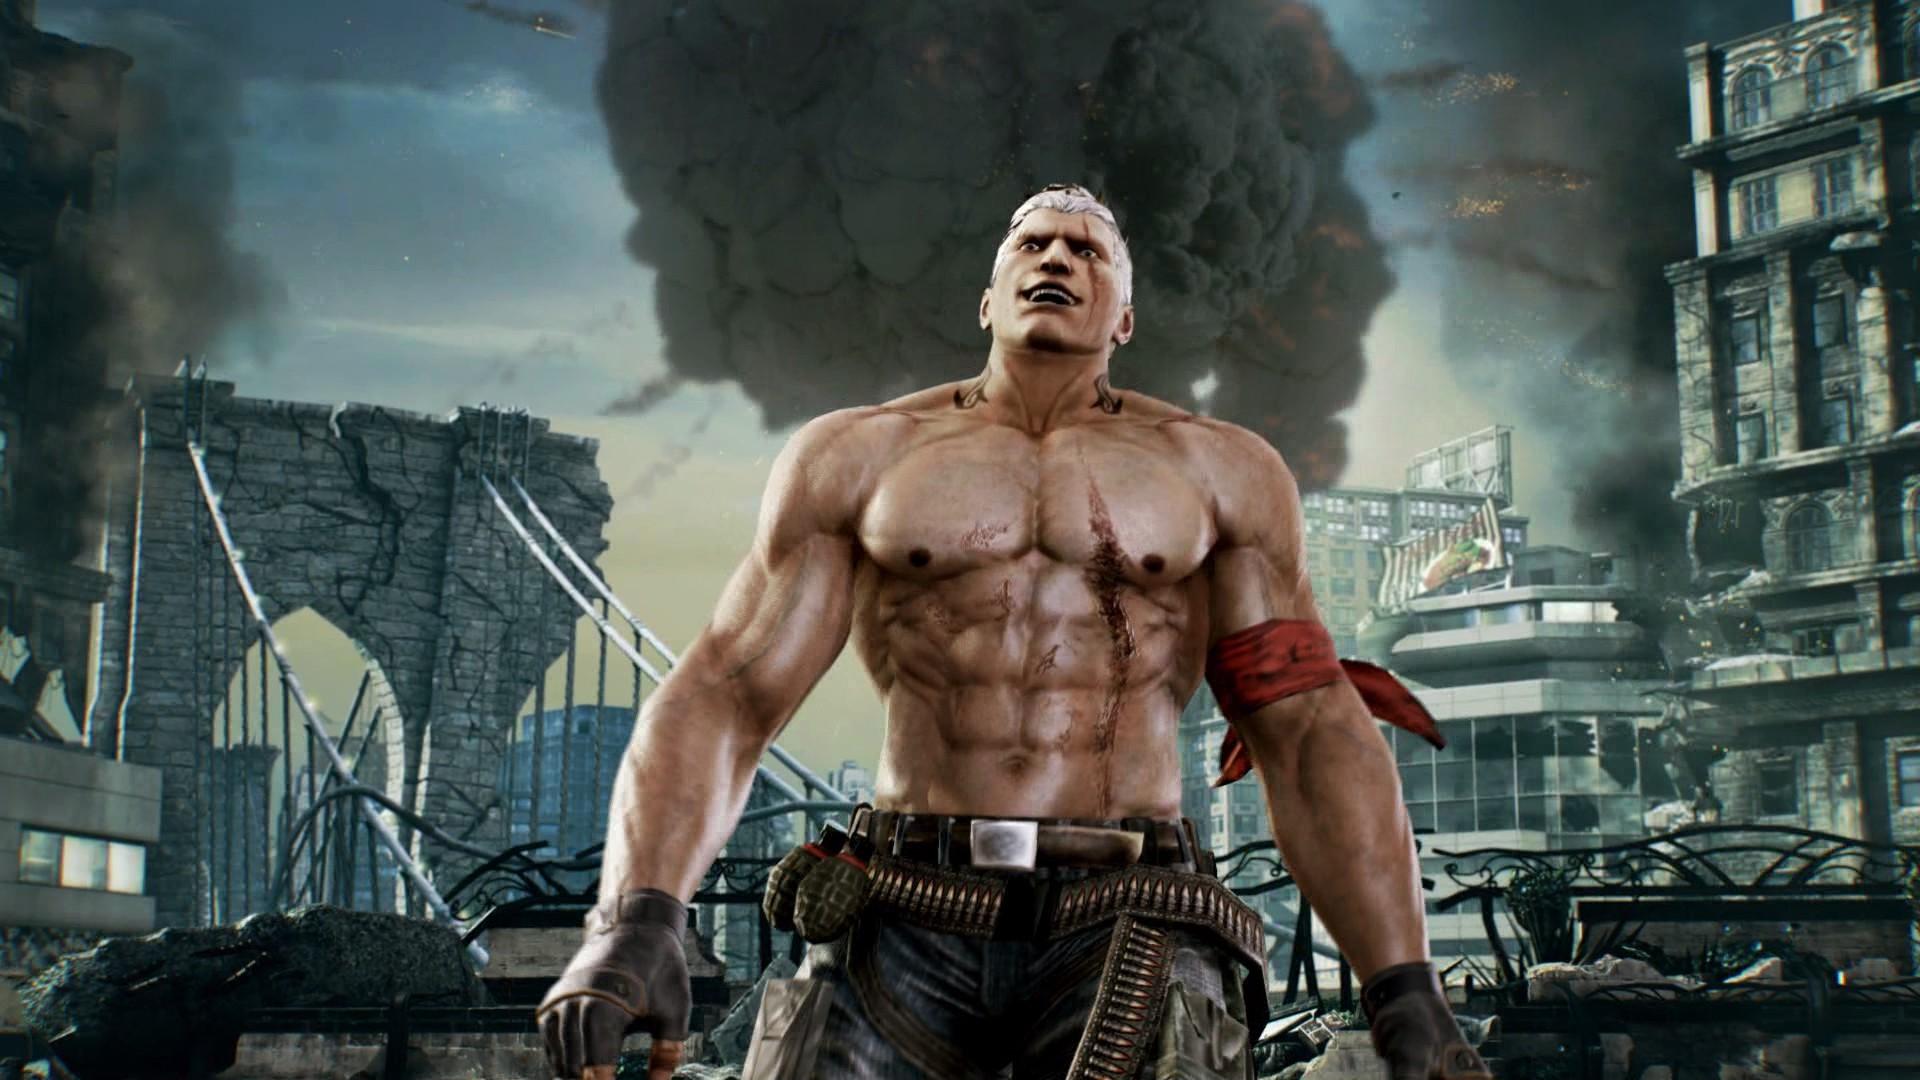 Fondos De Pantalla Tekken 7 Bryan Fury 1920x1080